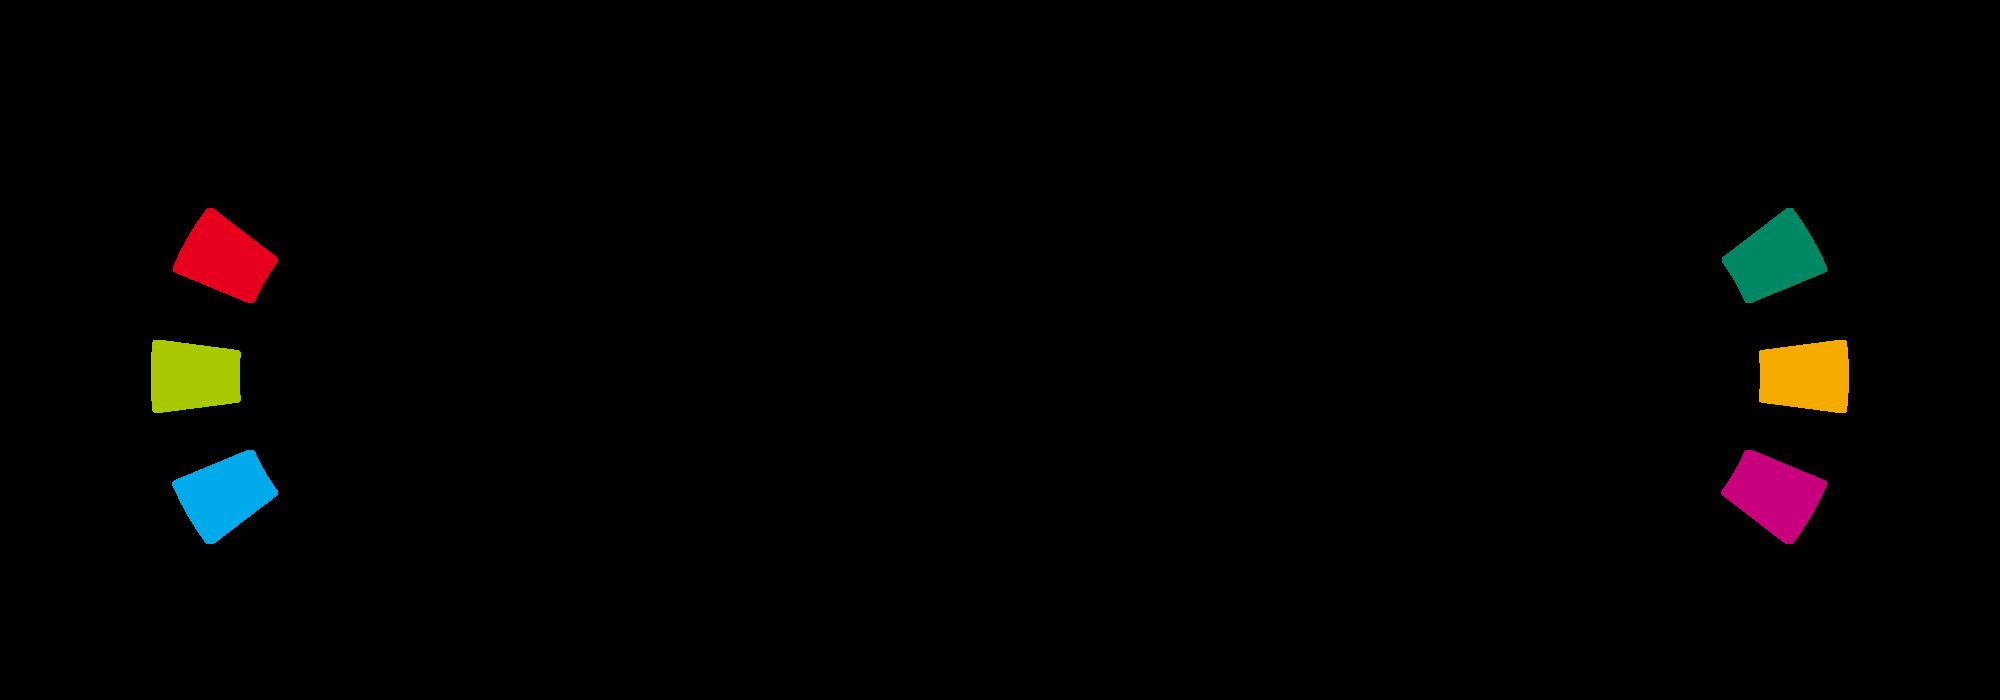 Amiibo